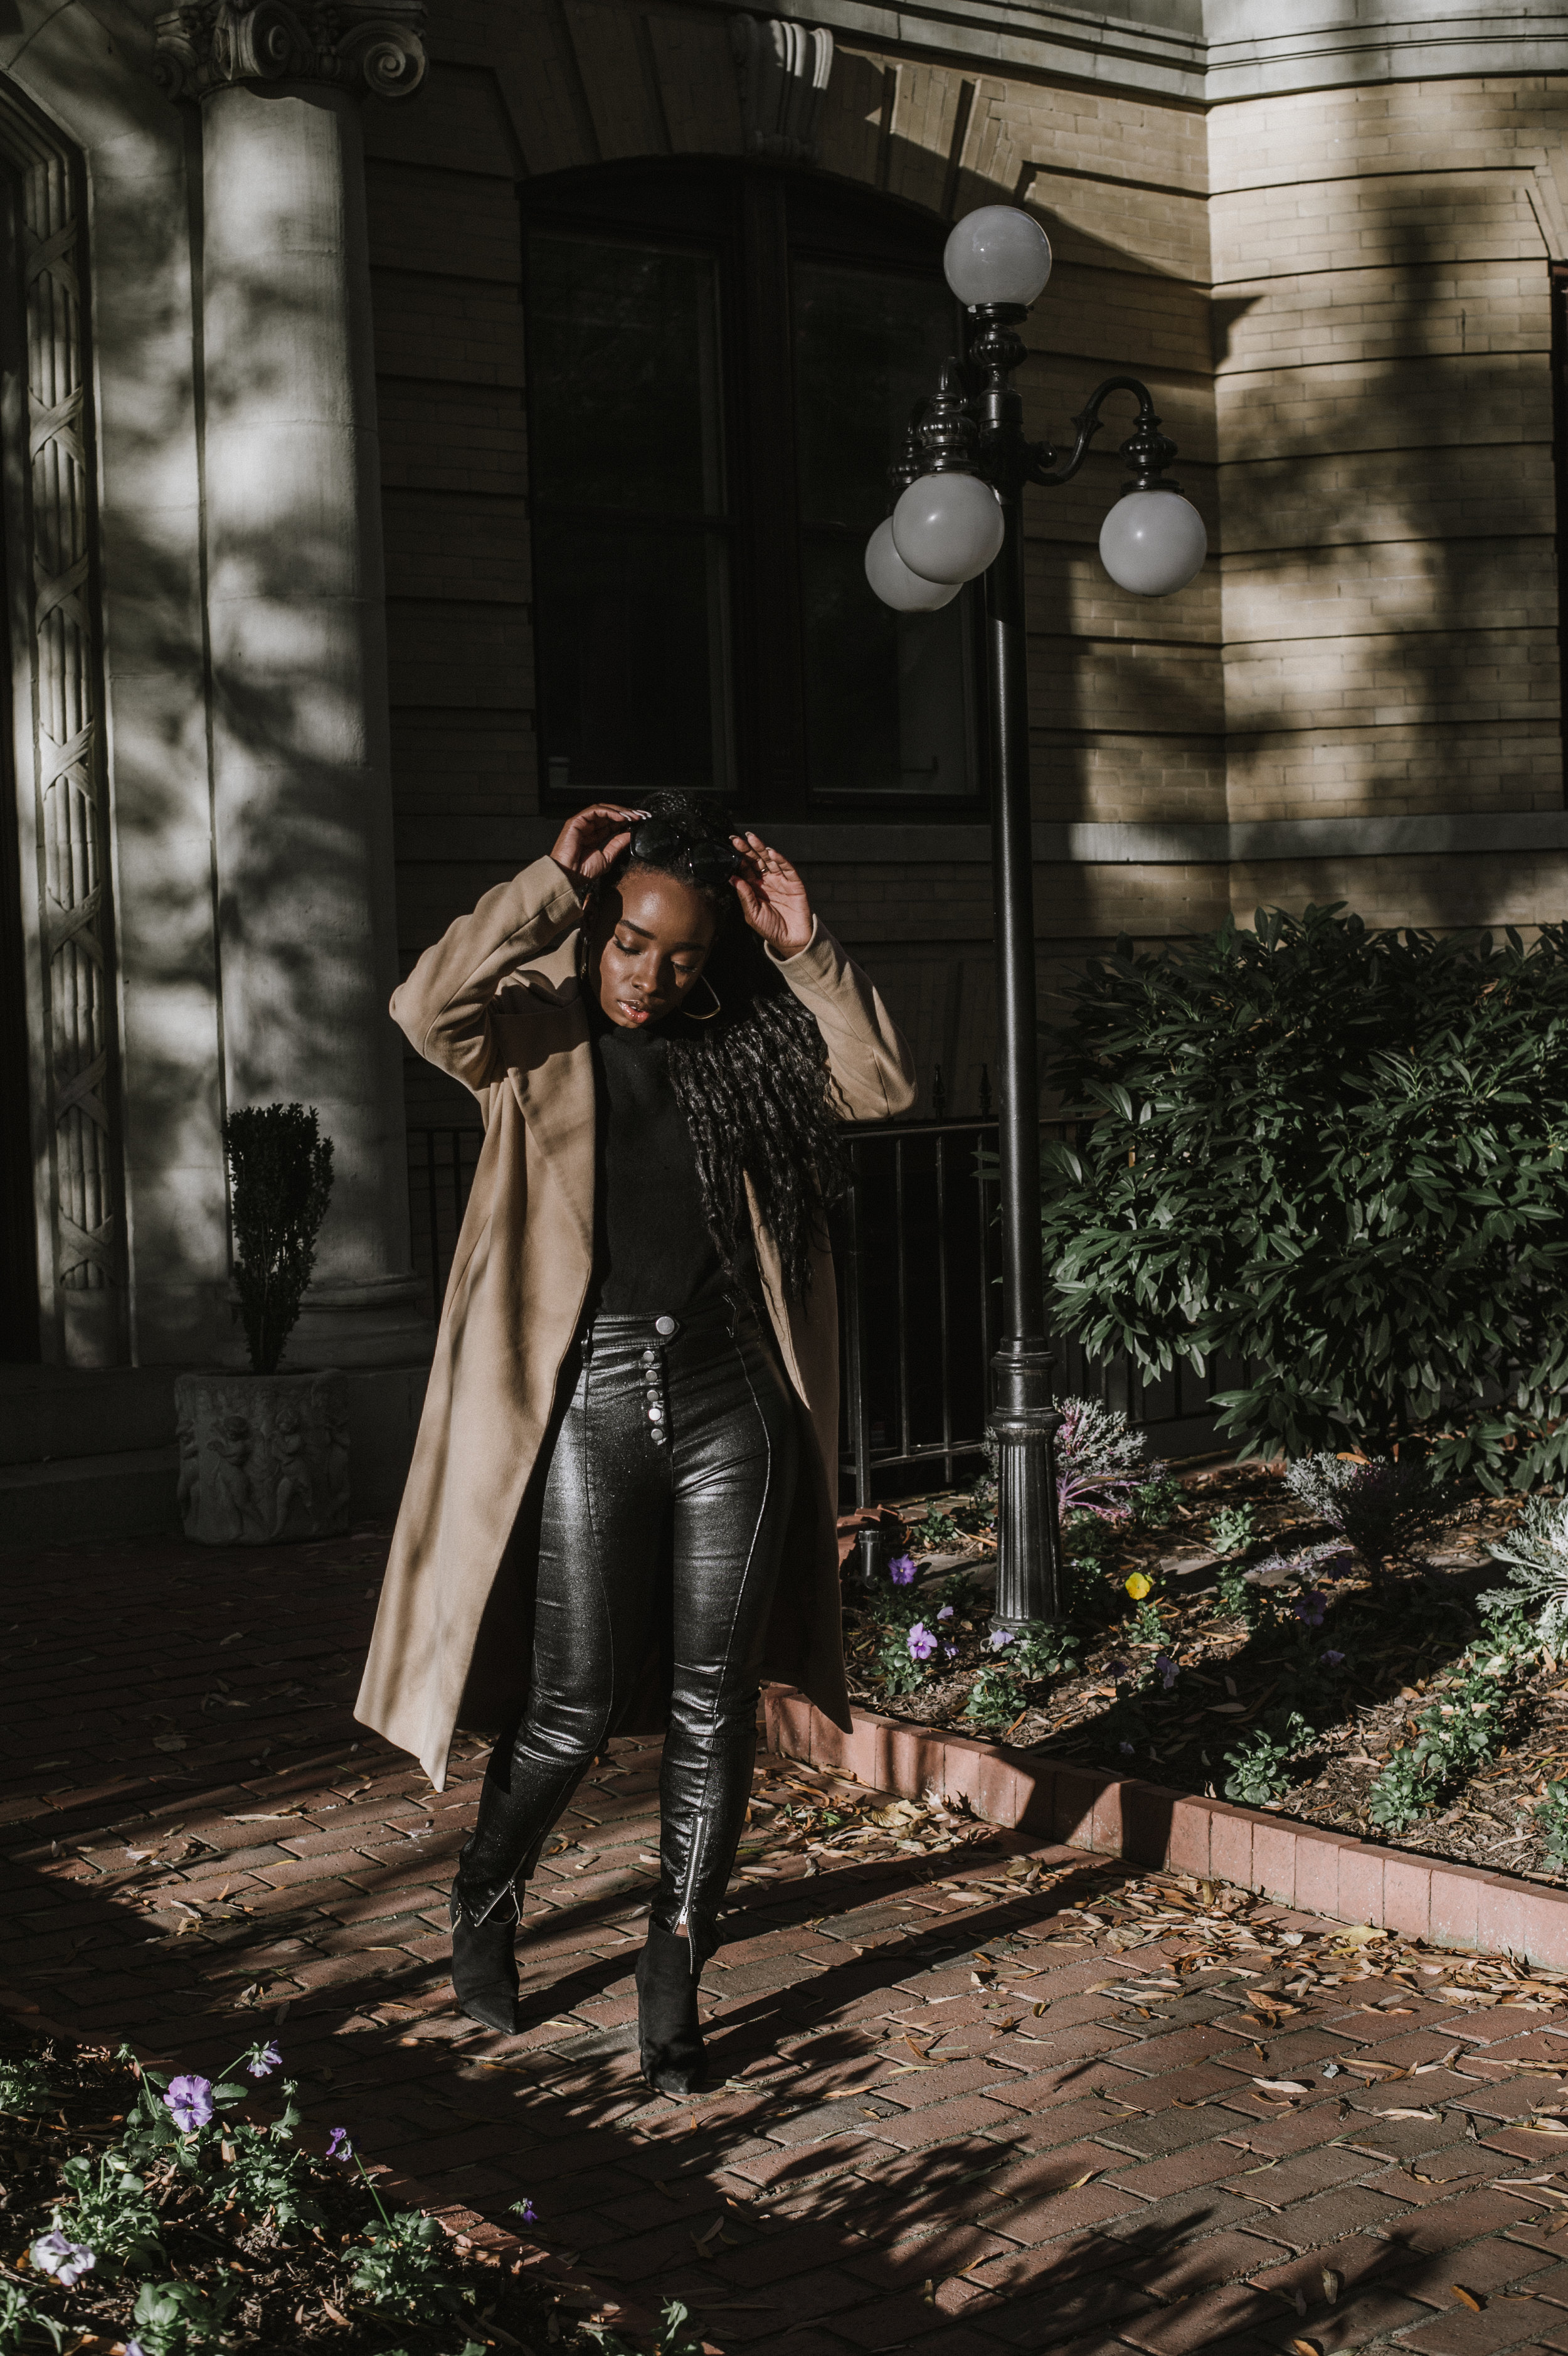 The-Glossier-Tasha-James-Fashion-Style-Blogger-DC-Winter-Coat-All-Black-13.jpg